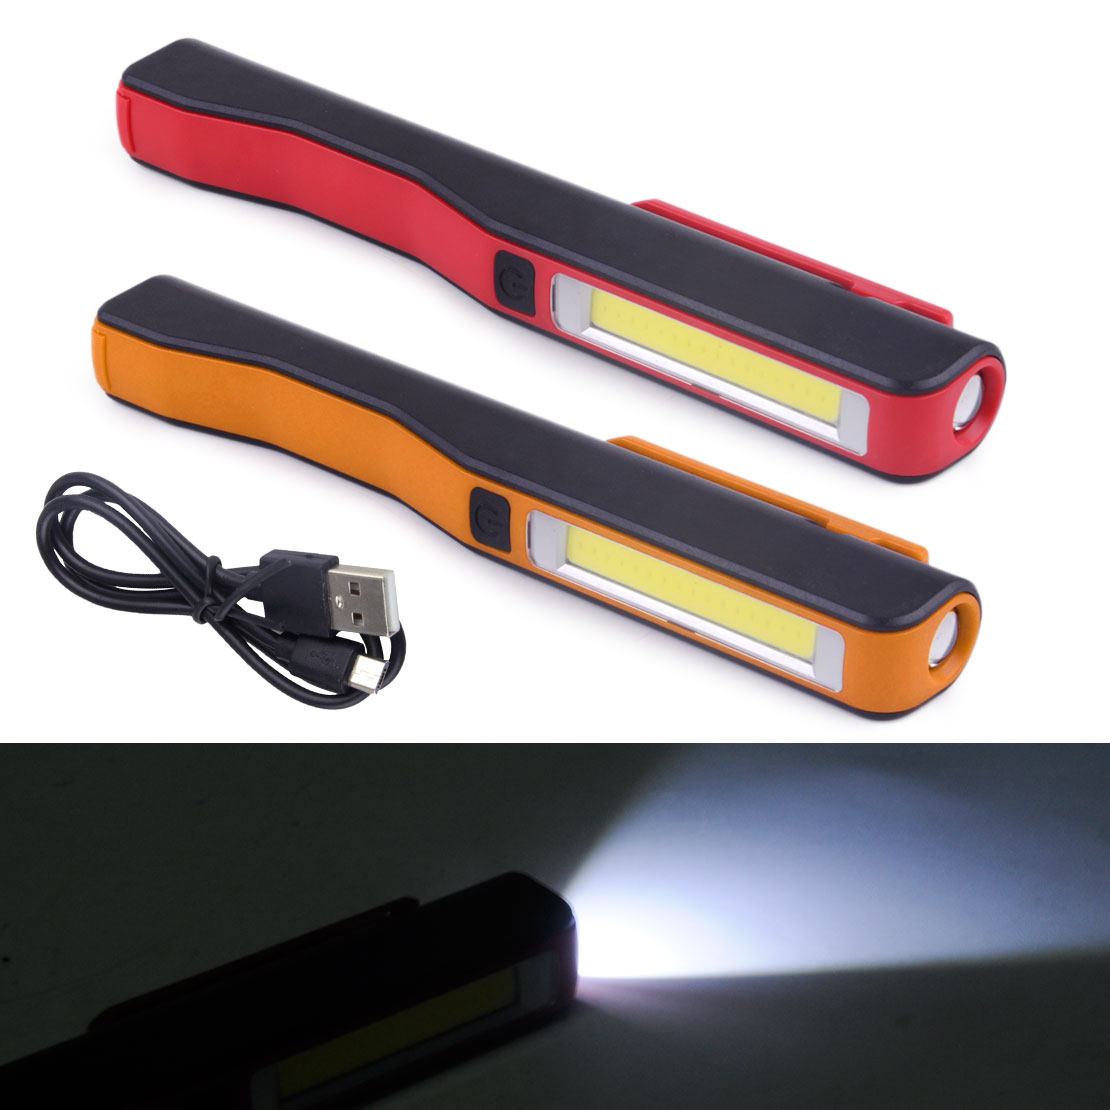 Small Pen LED COB Inspection Lamp Pocket Work Light Flexible Torch Magnetic Clip